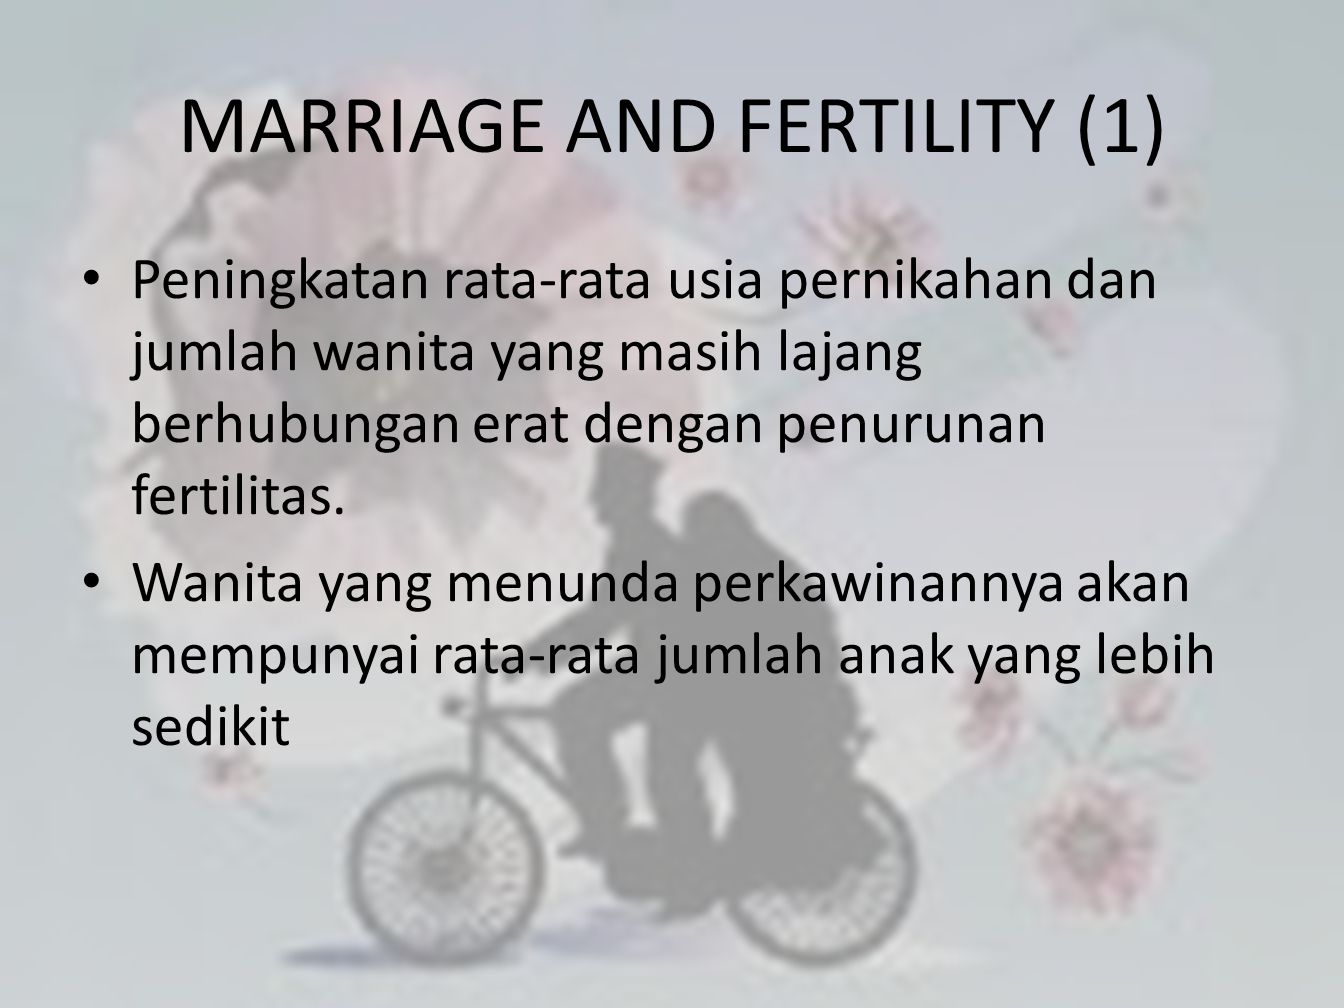 • Peningkatan rata-rata usia pernikahan dan jumlah wanita yang masih lajang berhubungan erat dengan penurunan fertilitas. • Wanita yang menunda perkaw